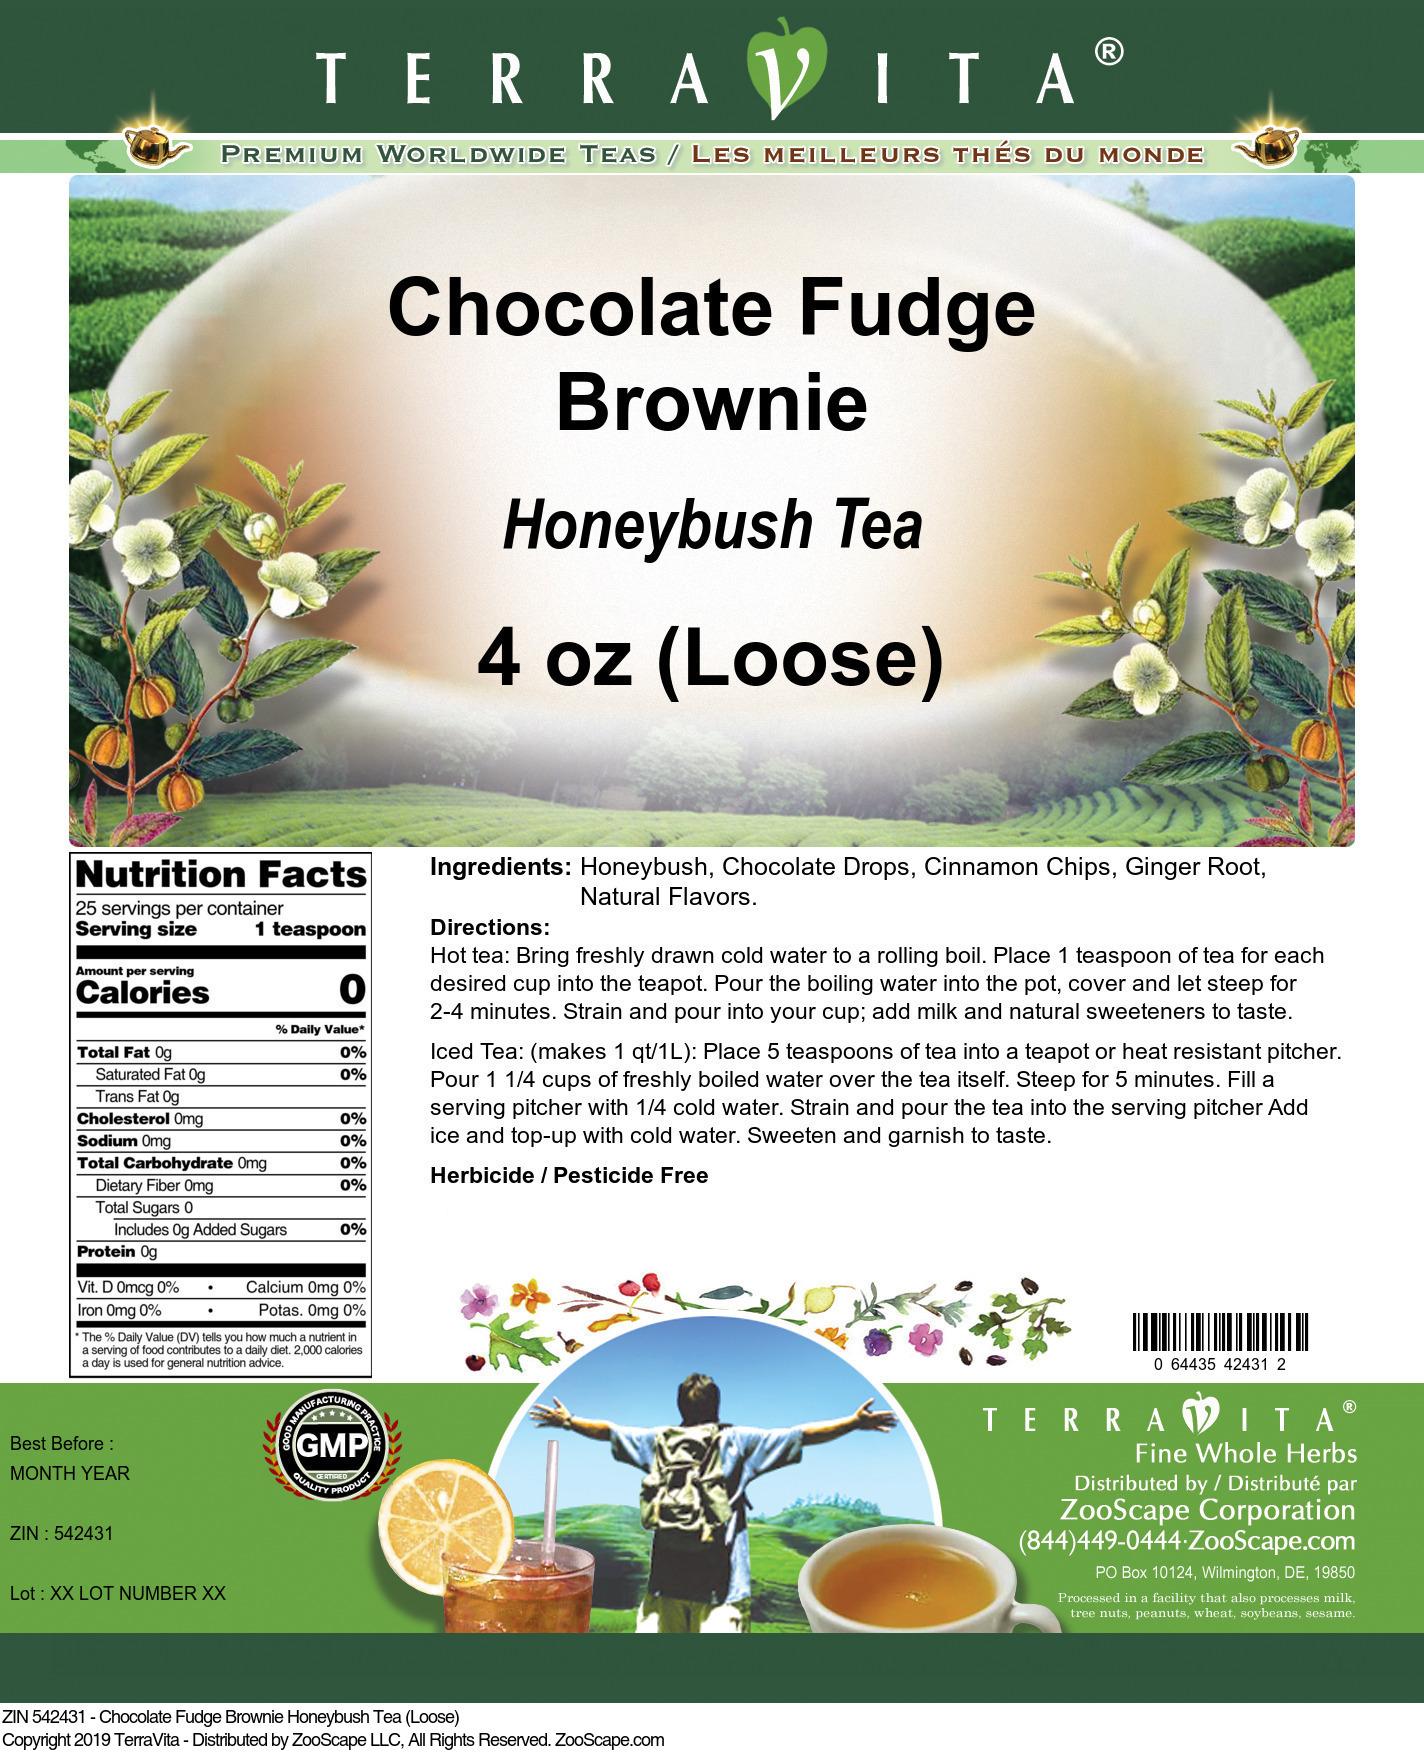 Chocolate Fudge Brownie Honeybush Tea (Loose)